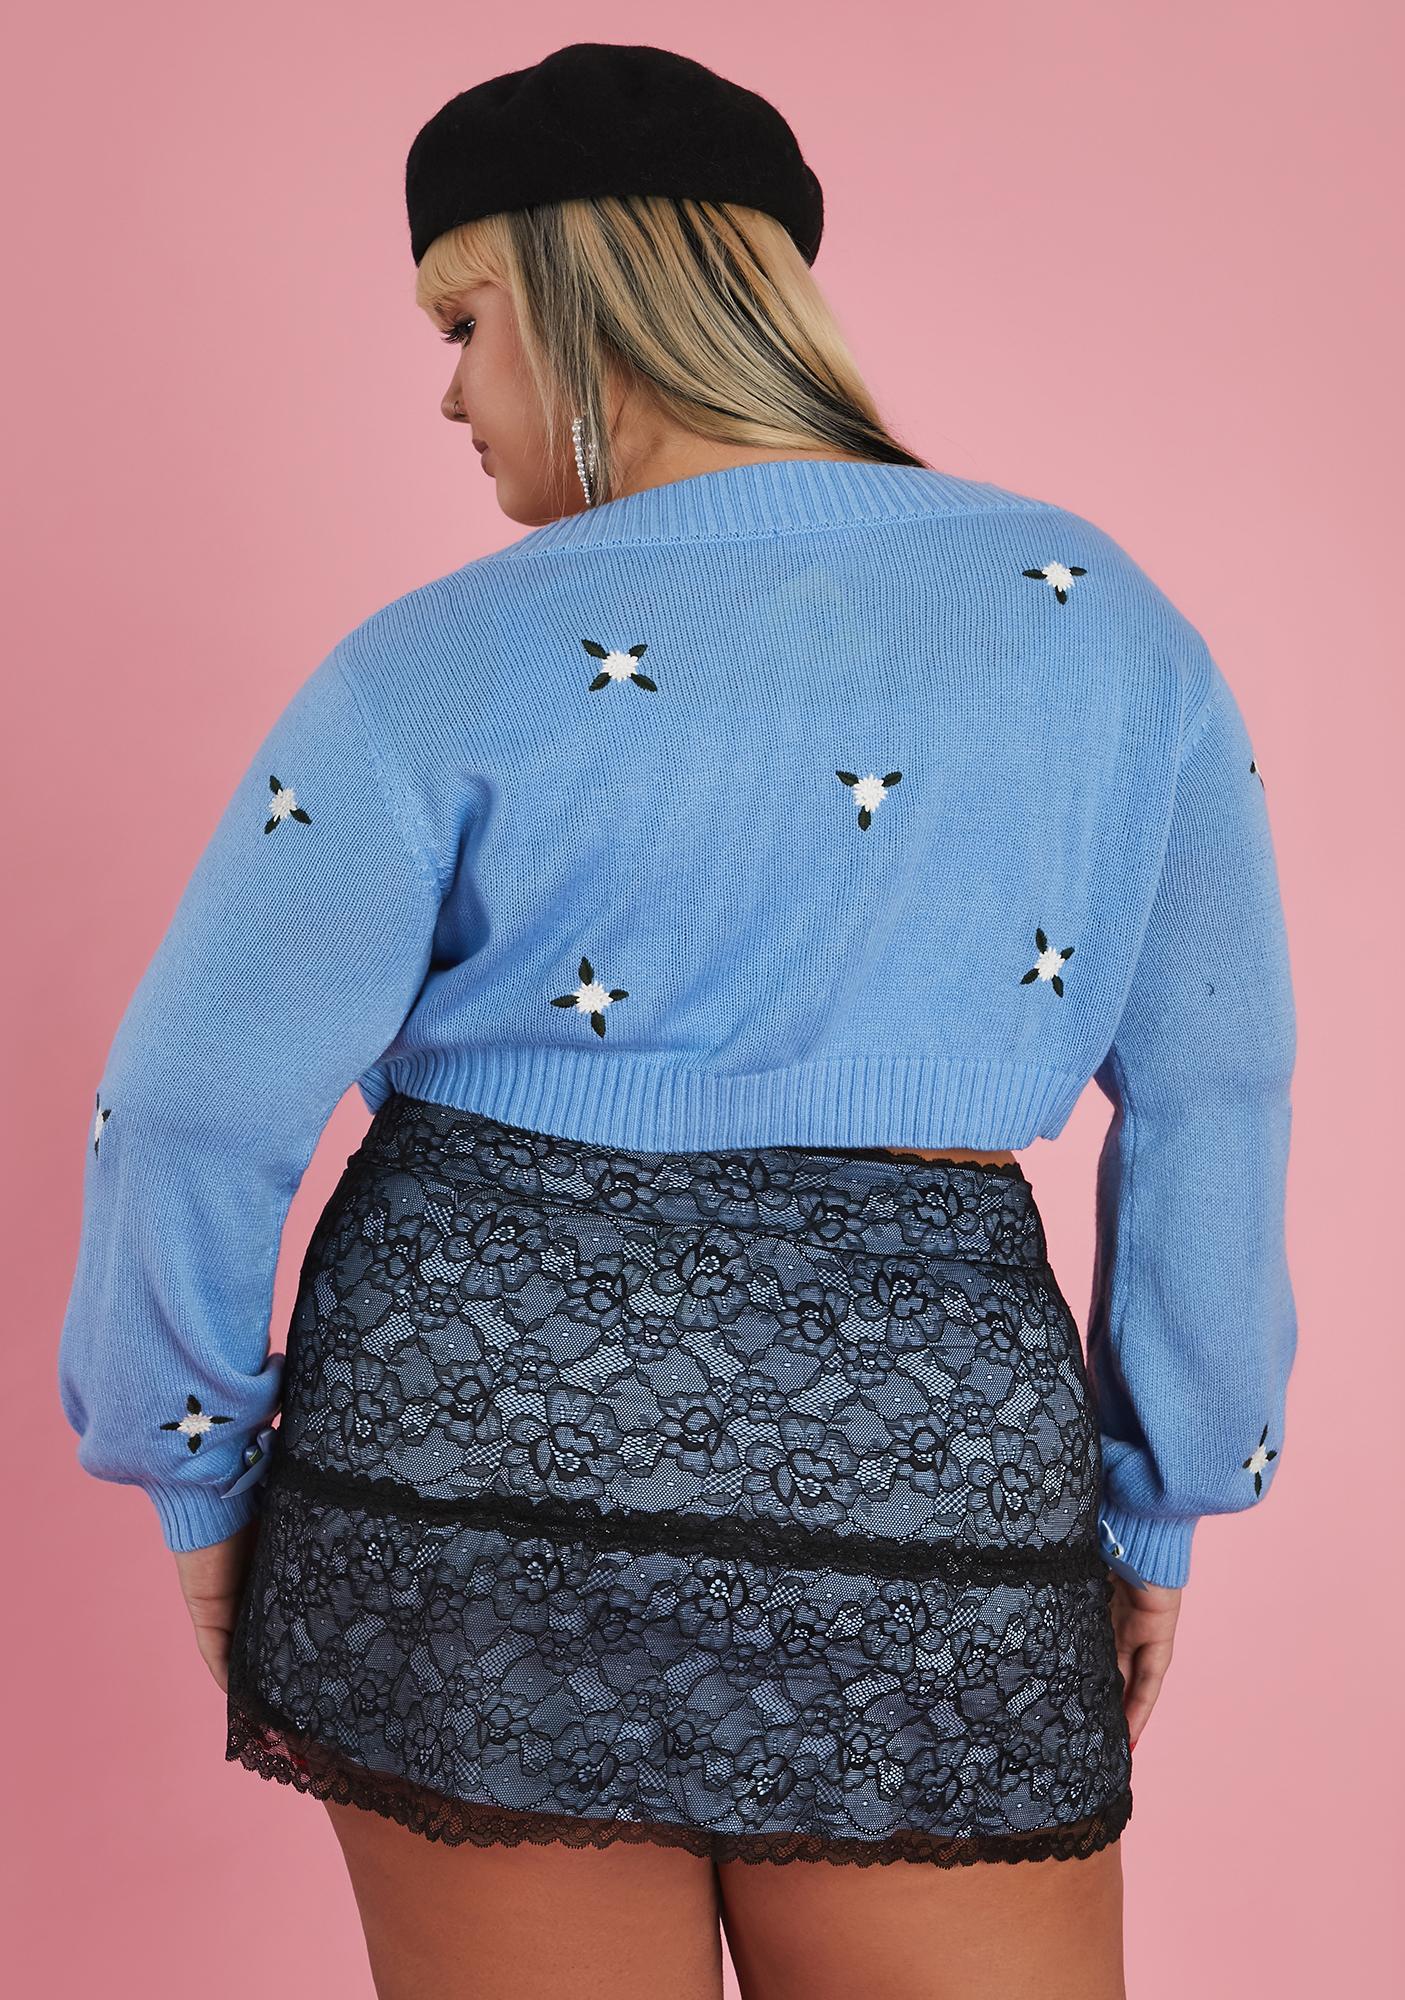 Sugar Thrillz So Prim And Proper Mini Skirt